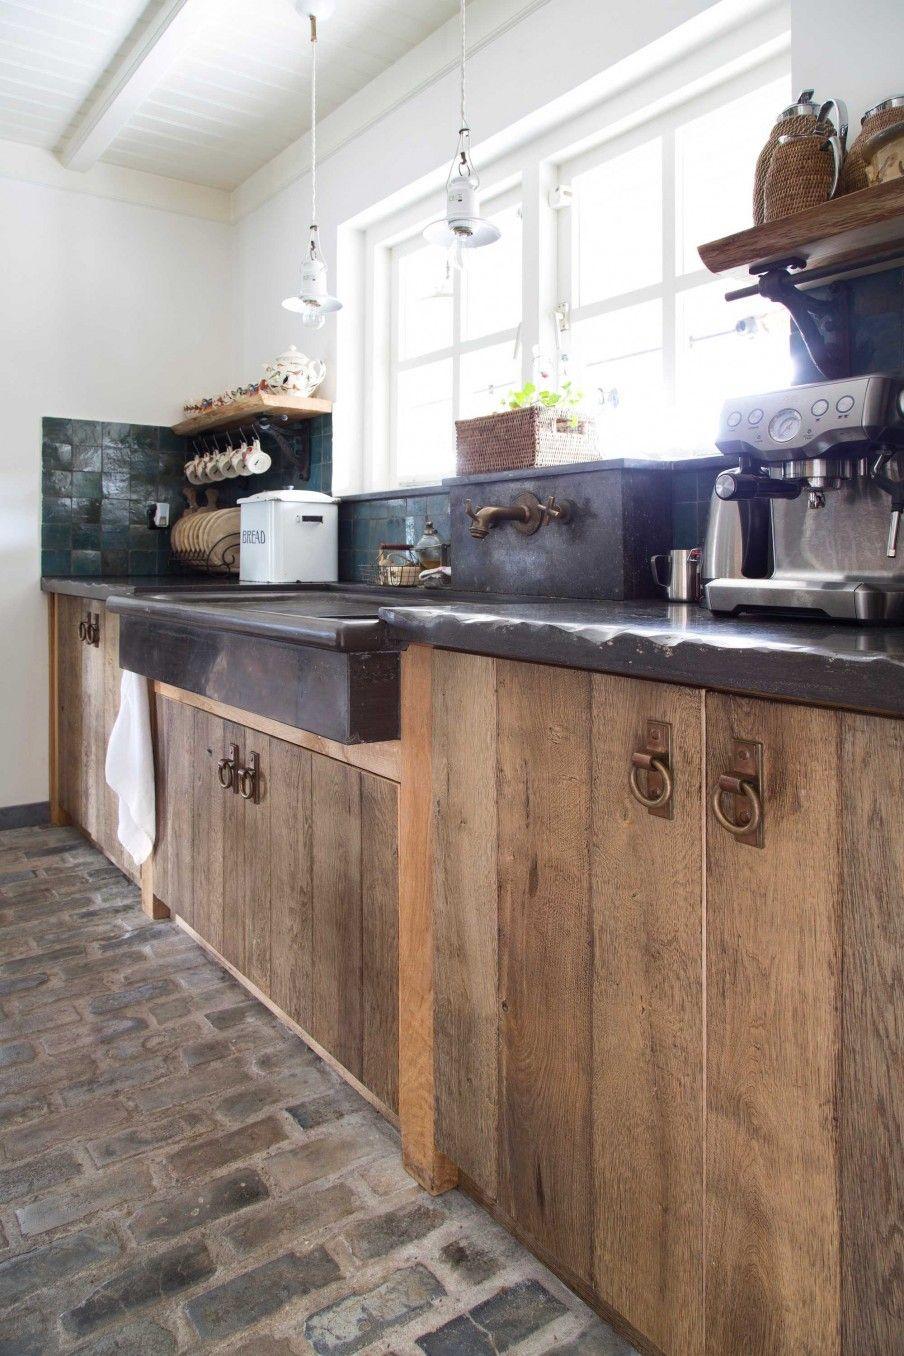 jle_rasenberg20160704_0580 | Küche, rustikal & Landhausstil ...